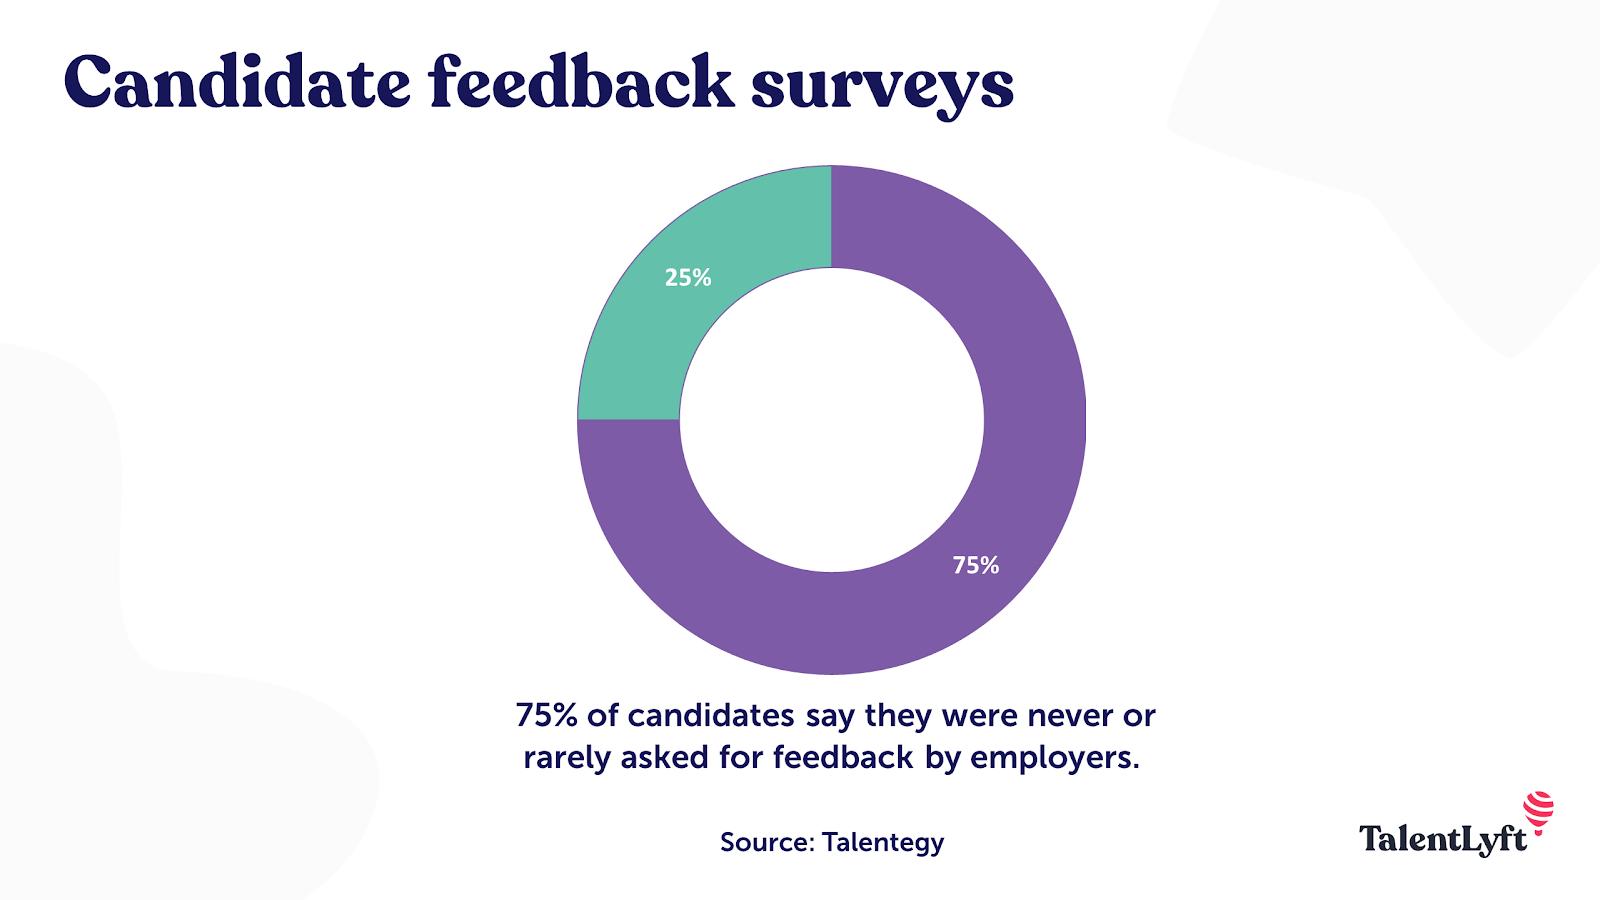 Candidate feedback survey